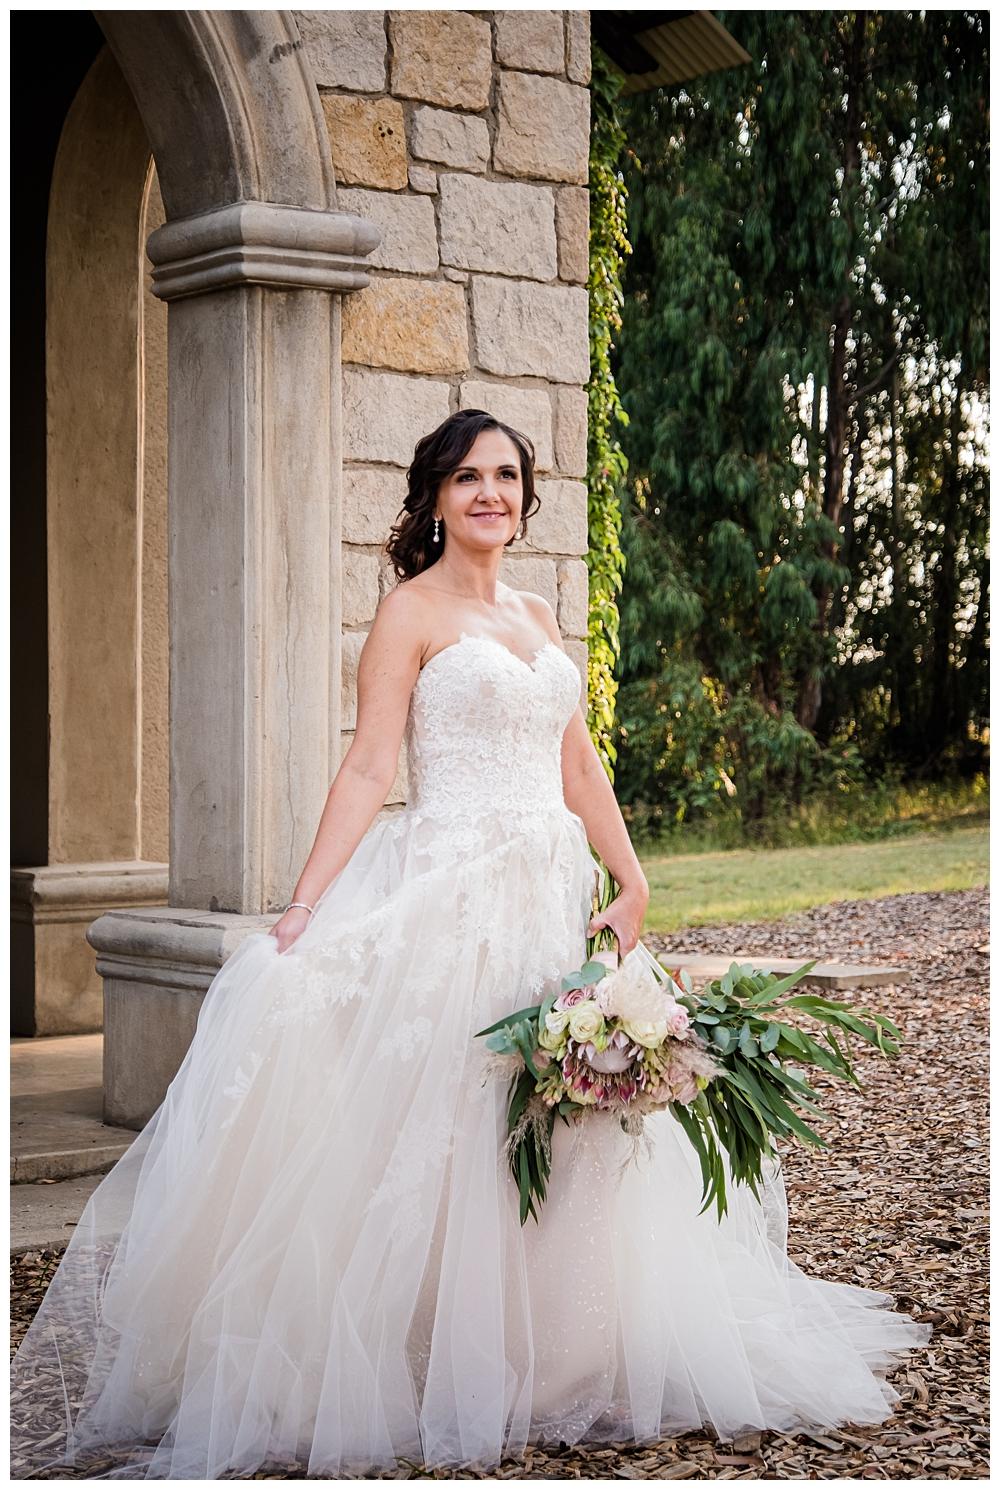 Best_Wedding_Photographer_AlexanderSmith_1180.jpg